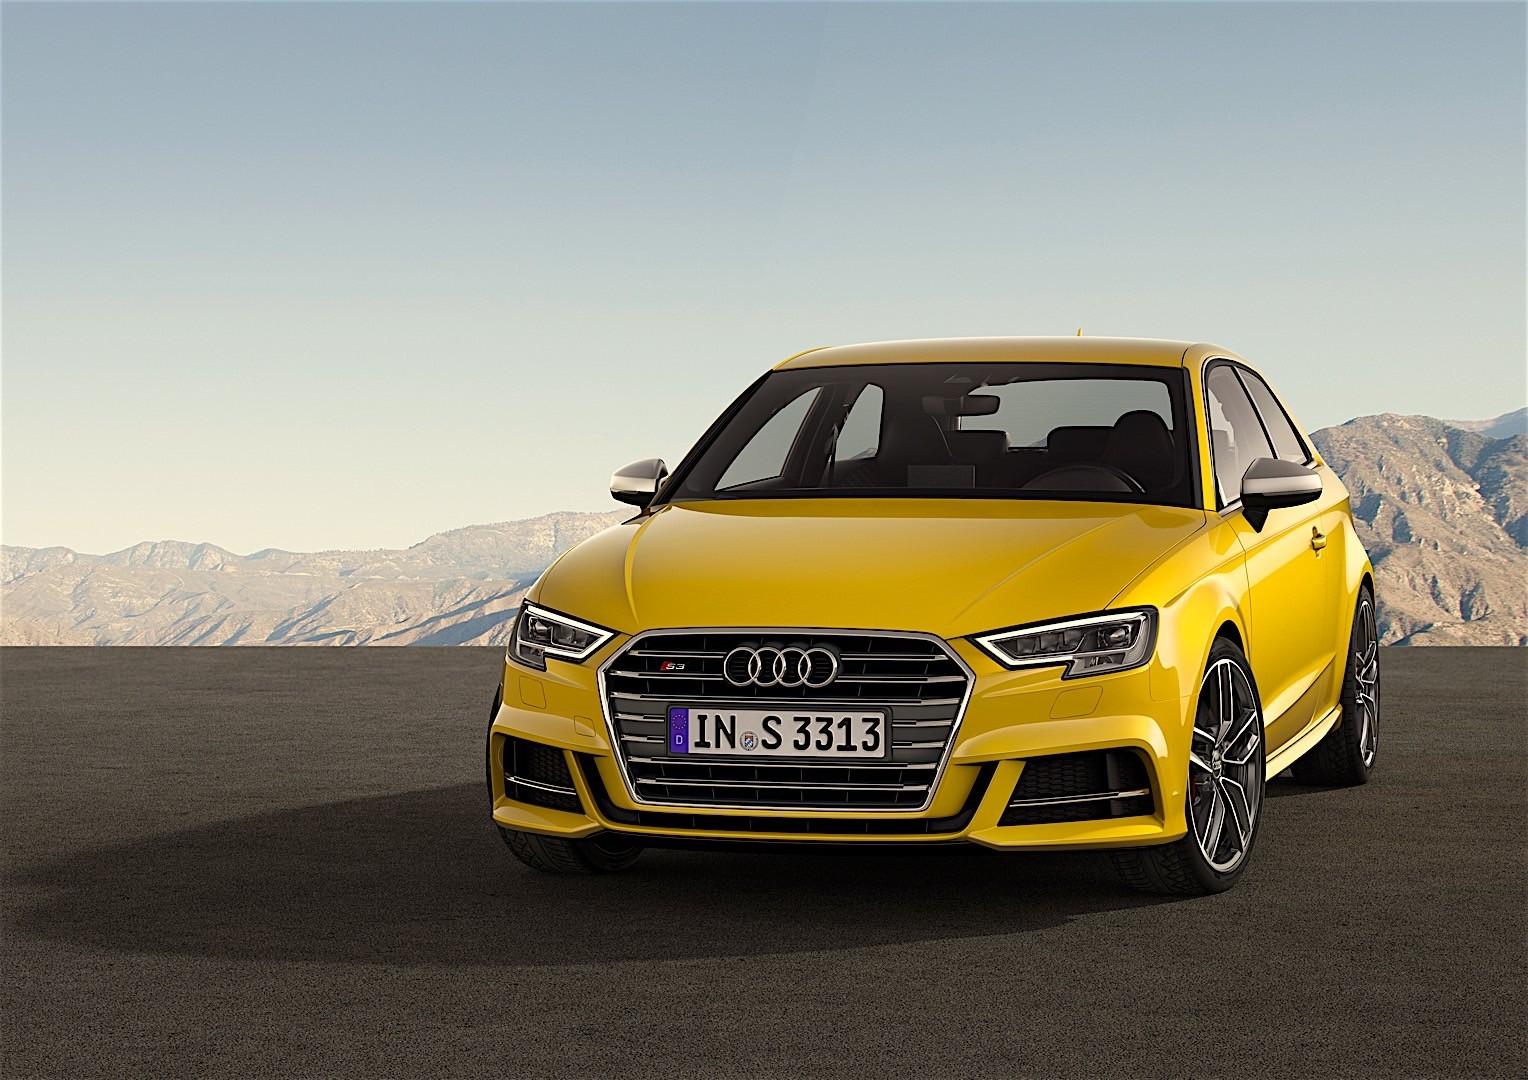 Audi Rs3 2018 >> AUDI S3 specs & photos - 2016, 2017, 2018, 2019 ...